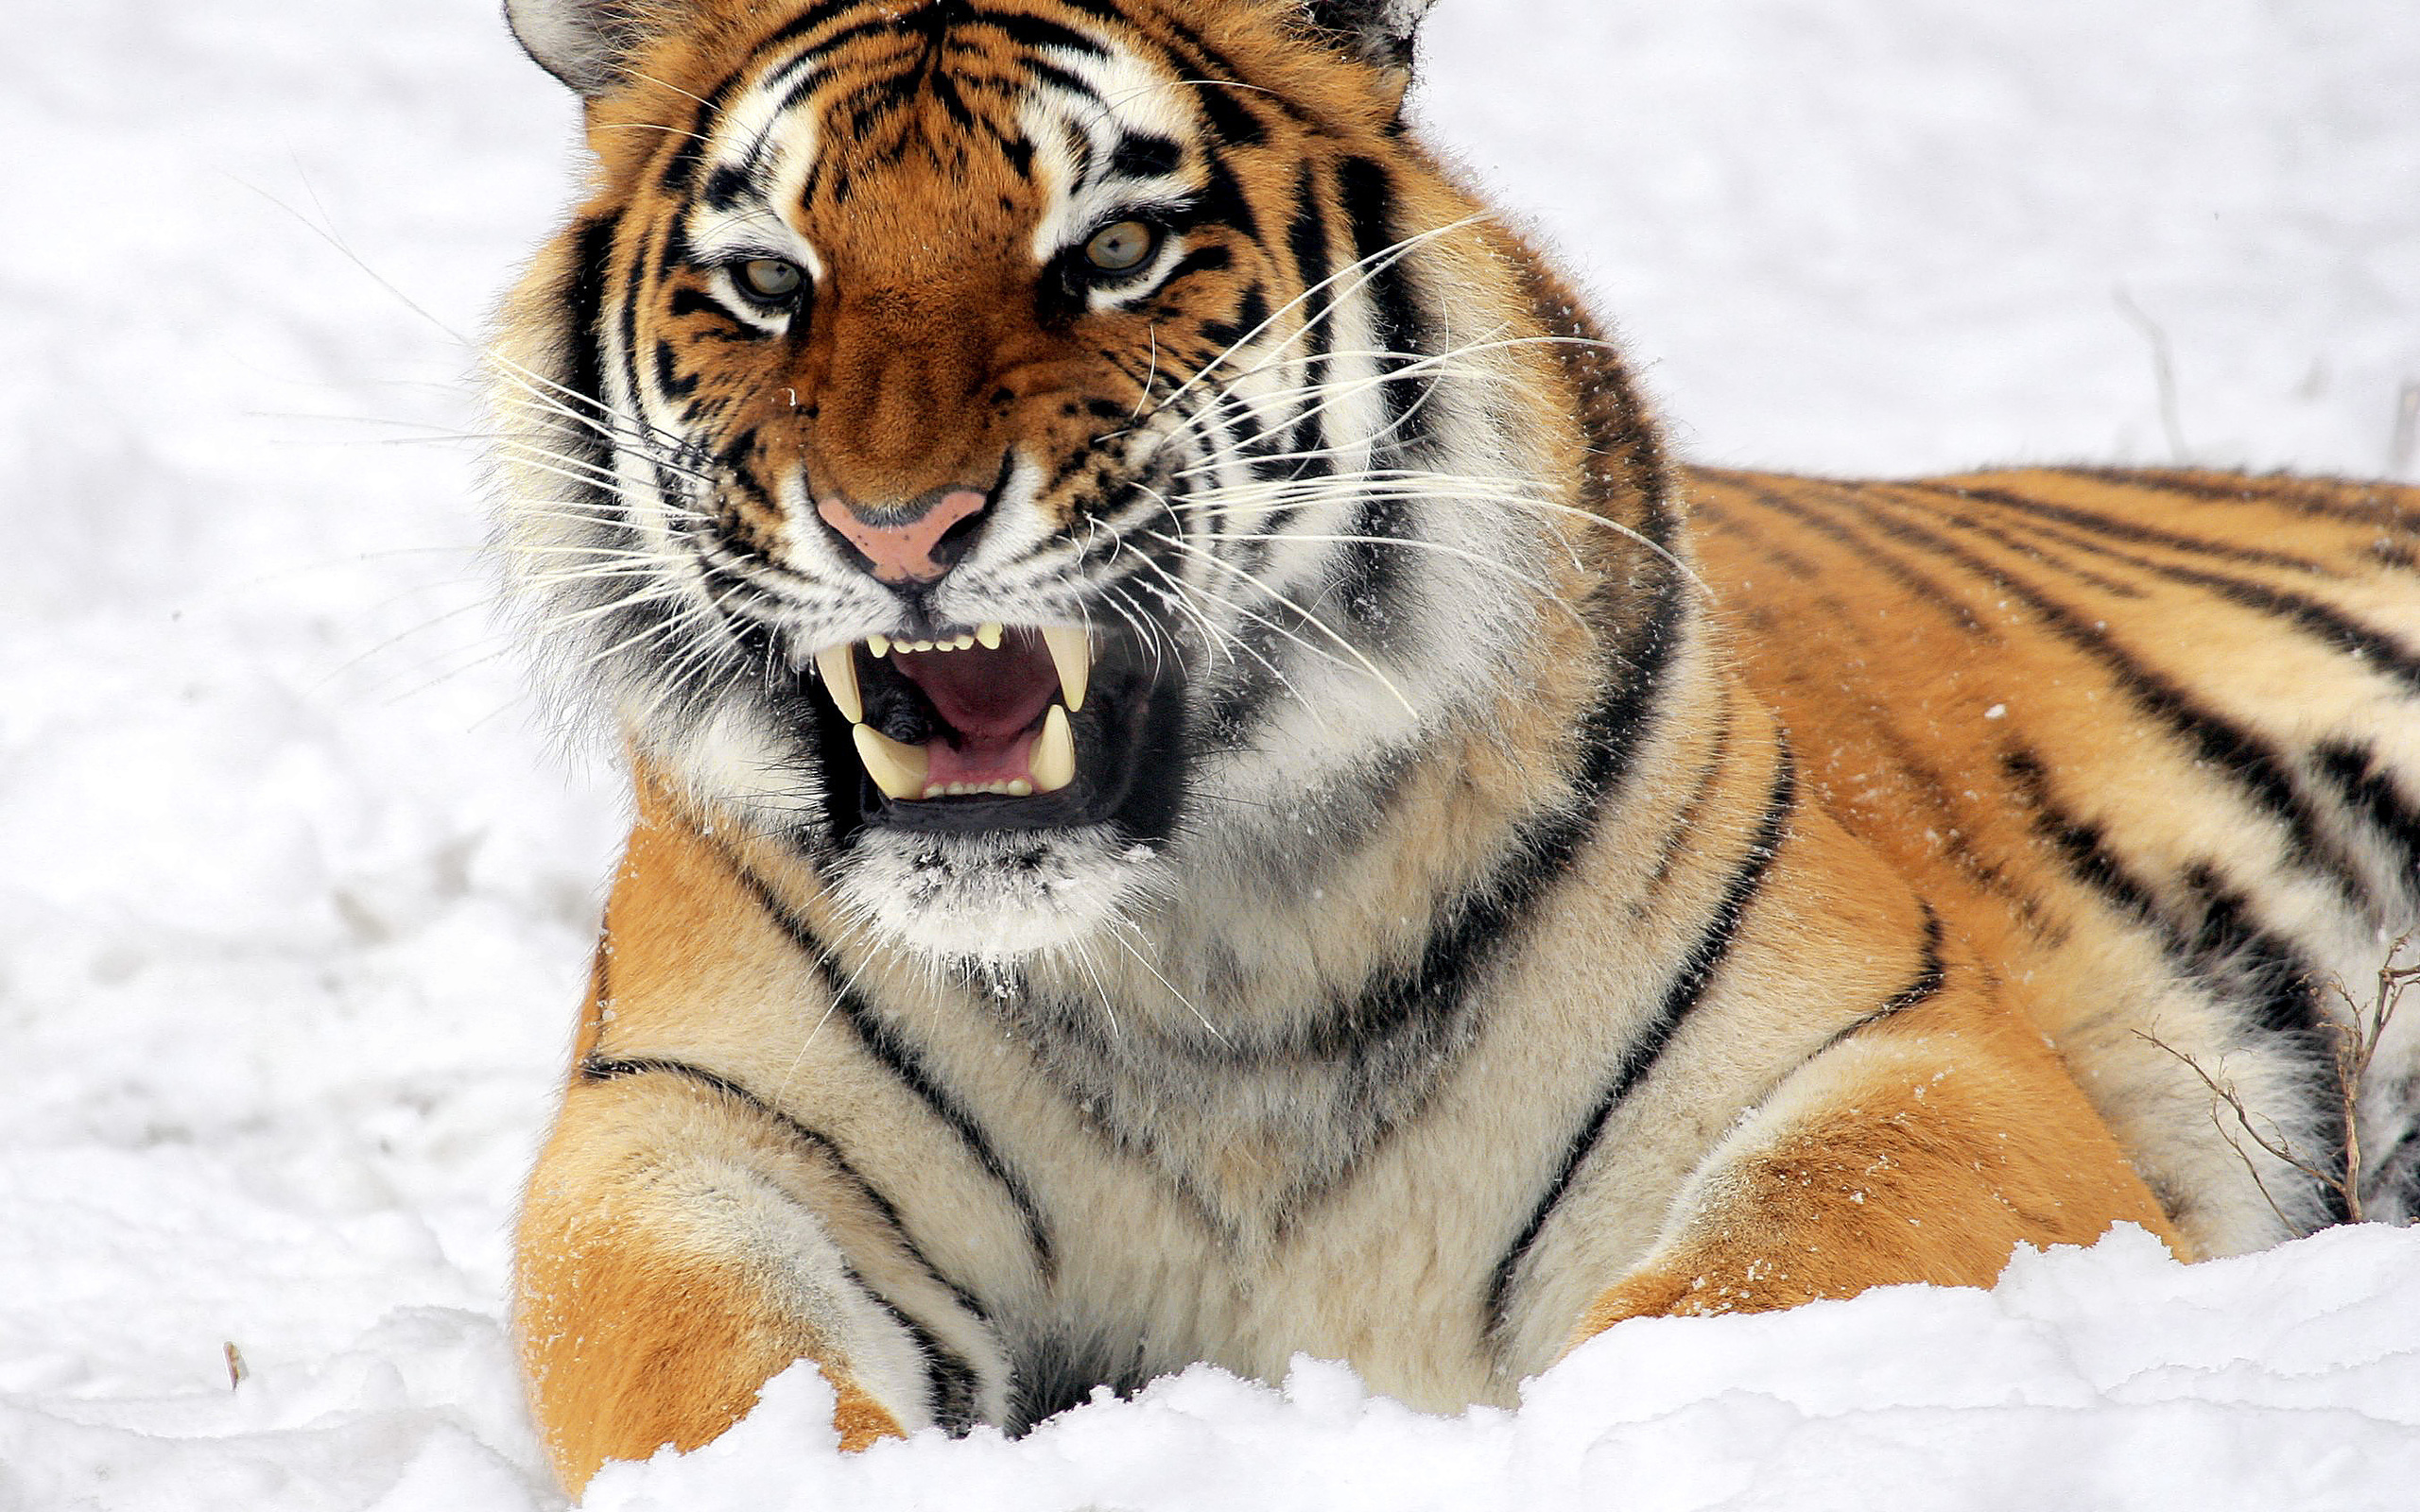 Картинка изображение тигра